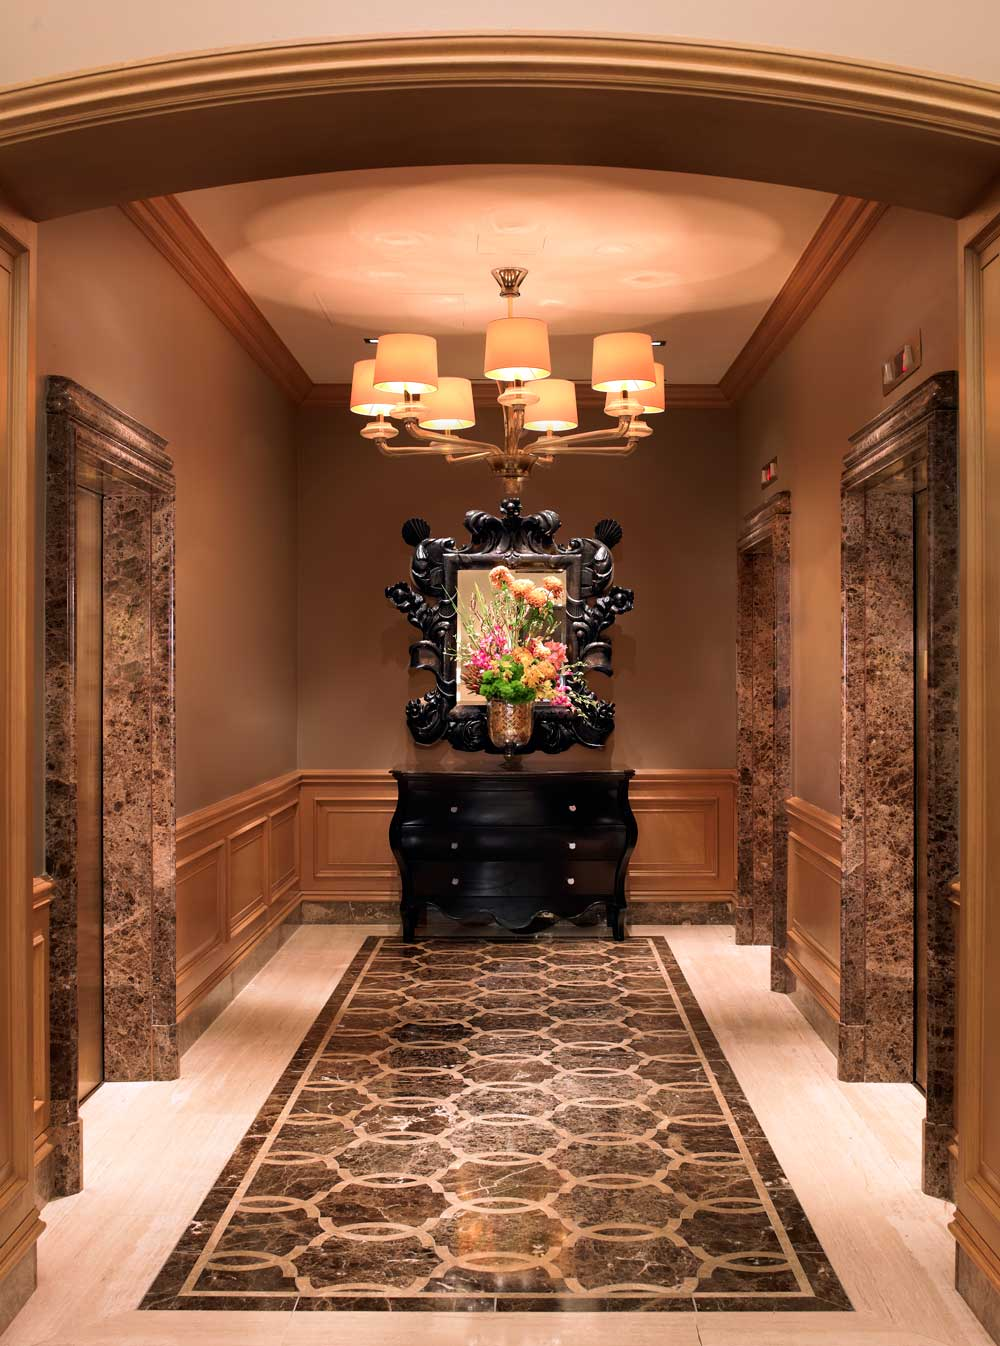 Lobby at The St Regis HoustonTx